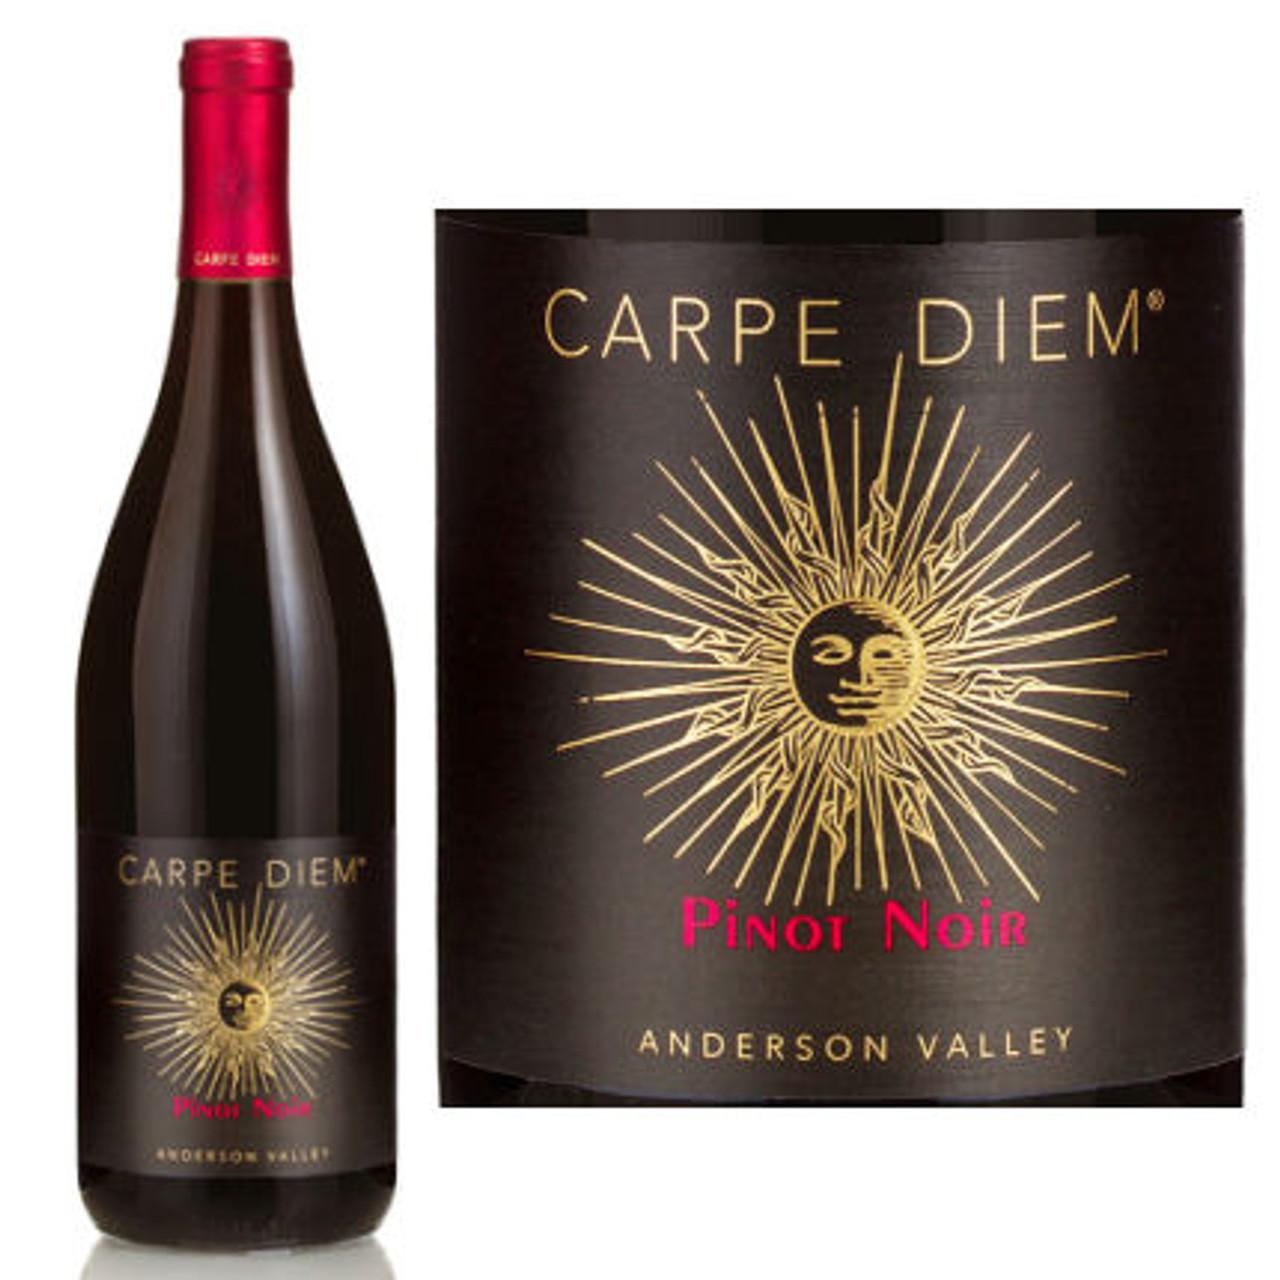 Carpe Diem Anderson Valley Pinot Noir